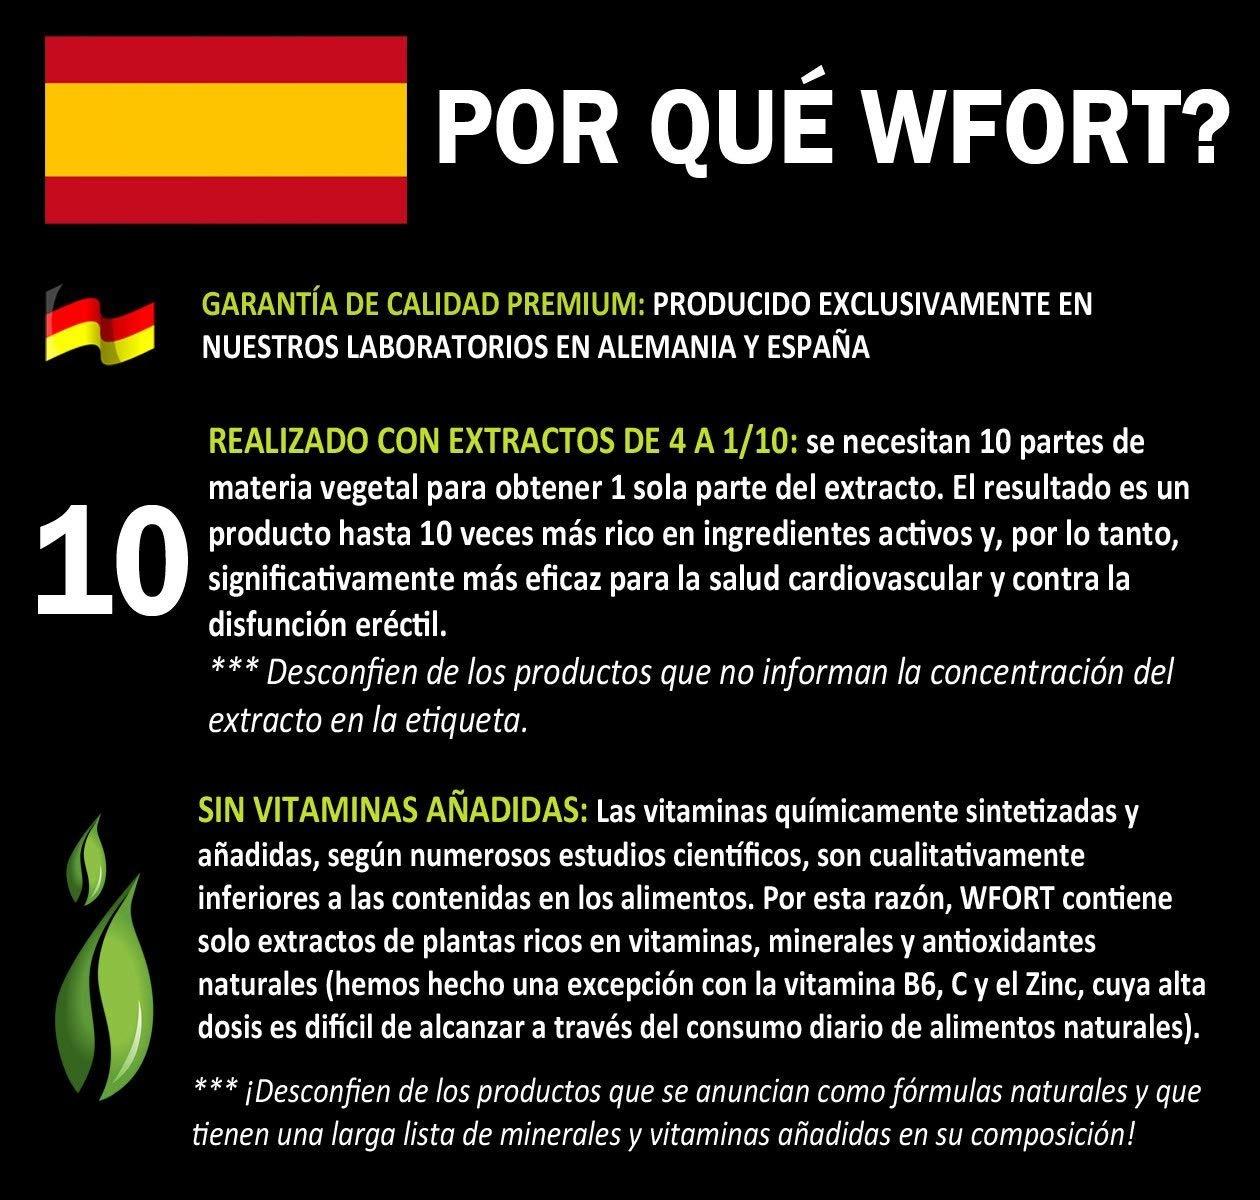 WFORT - 90 Pastillas L-Arginina, Maca, Ginseng, Tribulus, Guaranà, Goji, Zinco: Amazon.es: Salud y cuidado personal